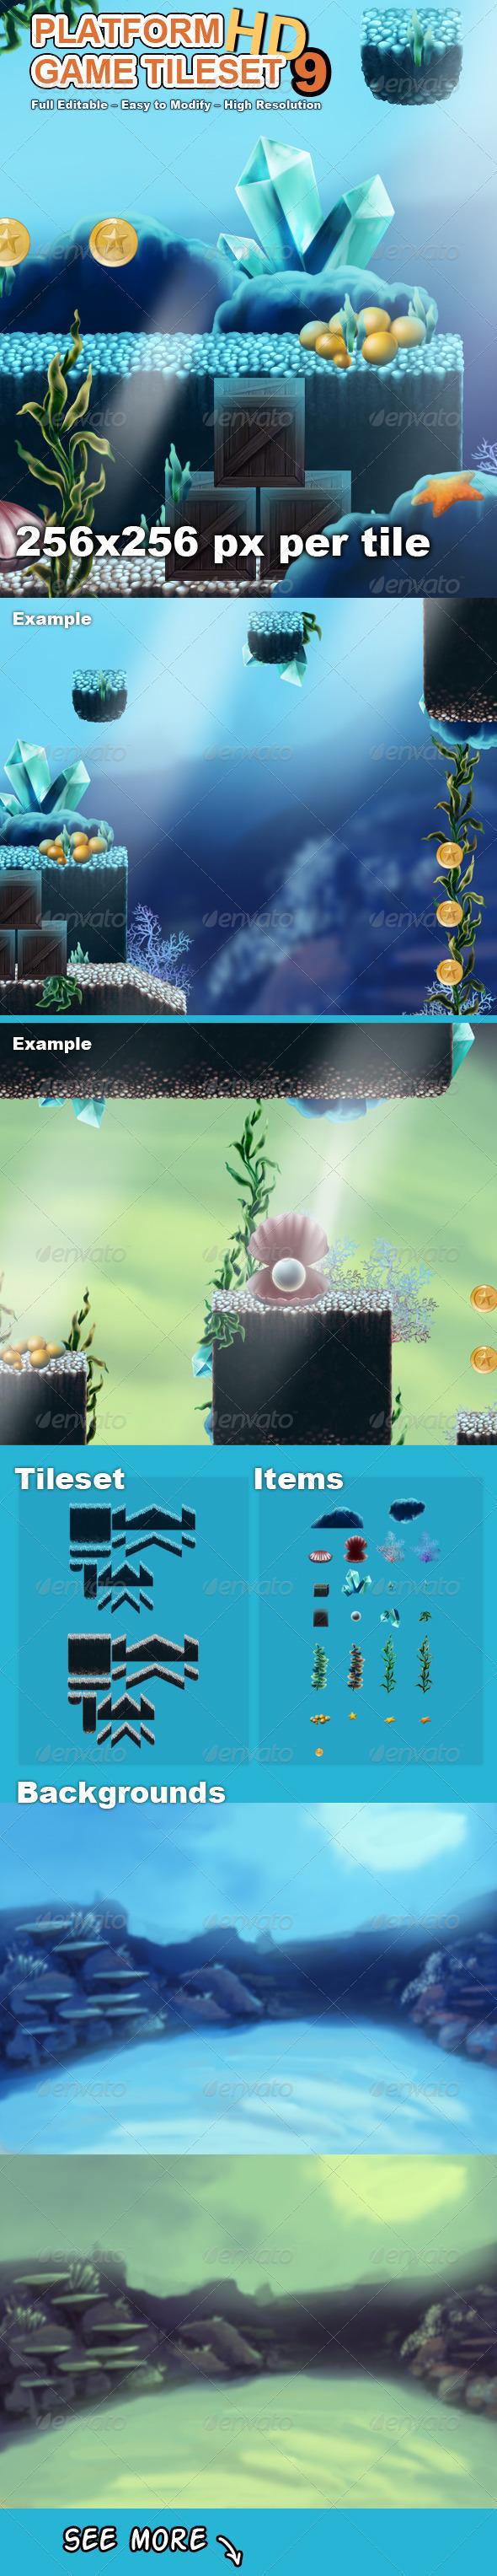 GraphicRiver Platform Game Tileset 9 HD 7793911